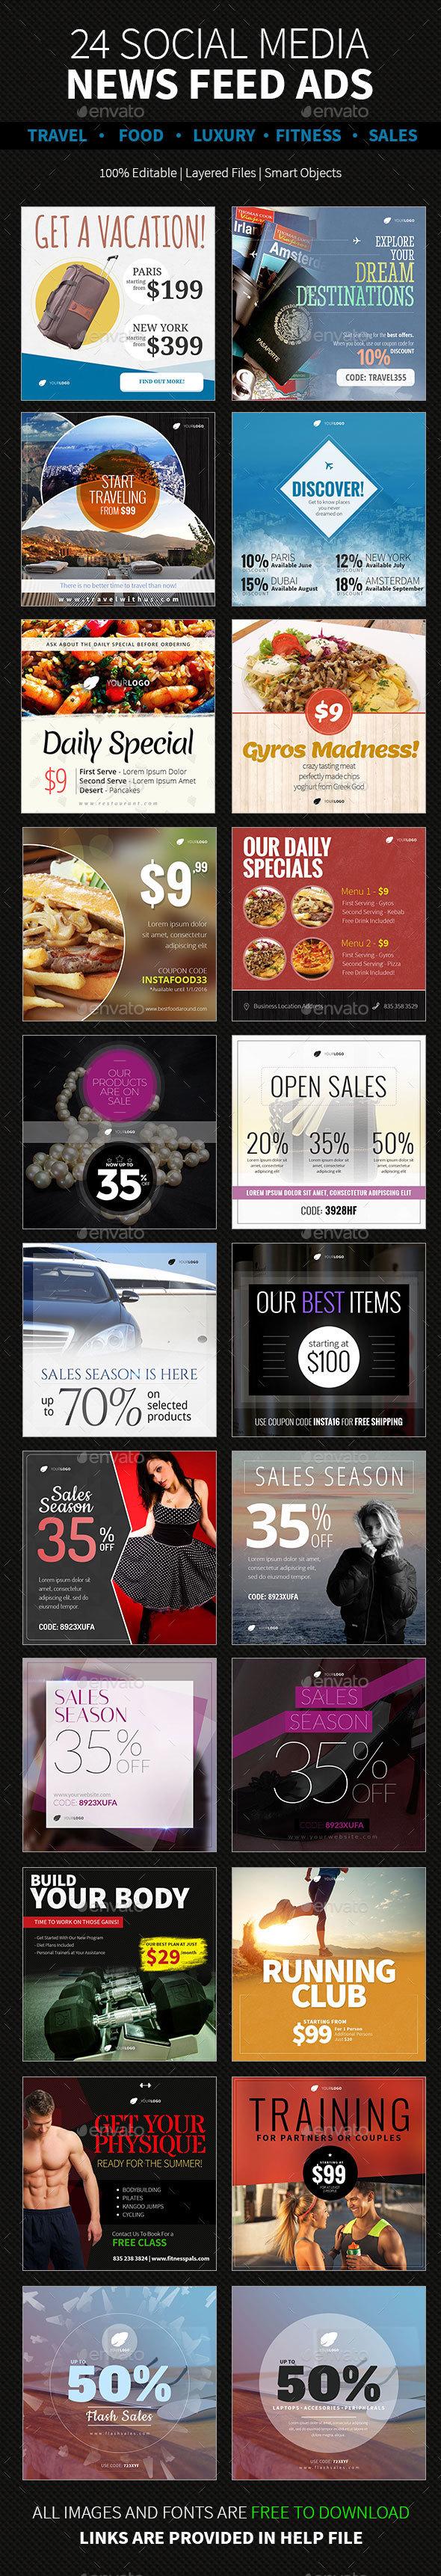 24 News Feed Ads | Category Based - Social Media Web Elements